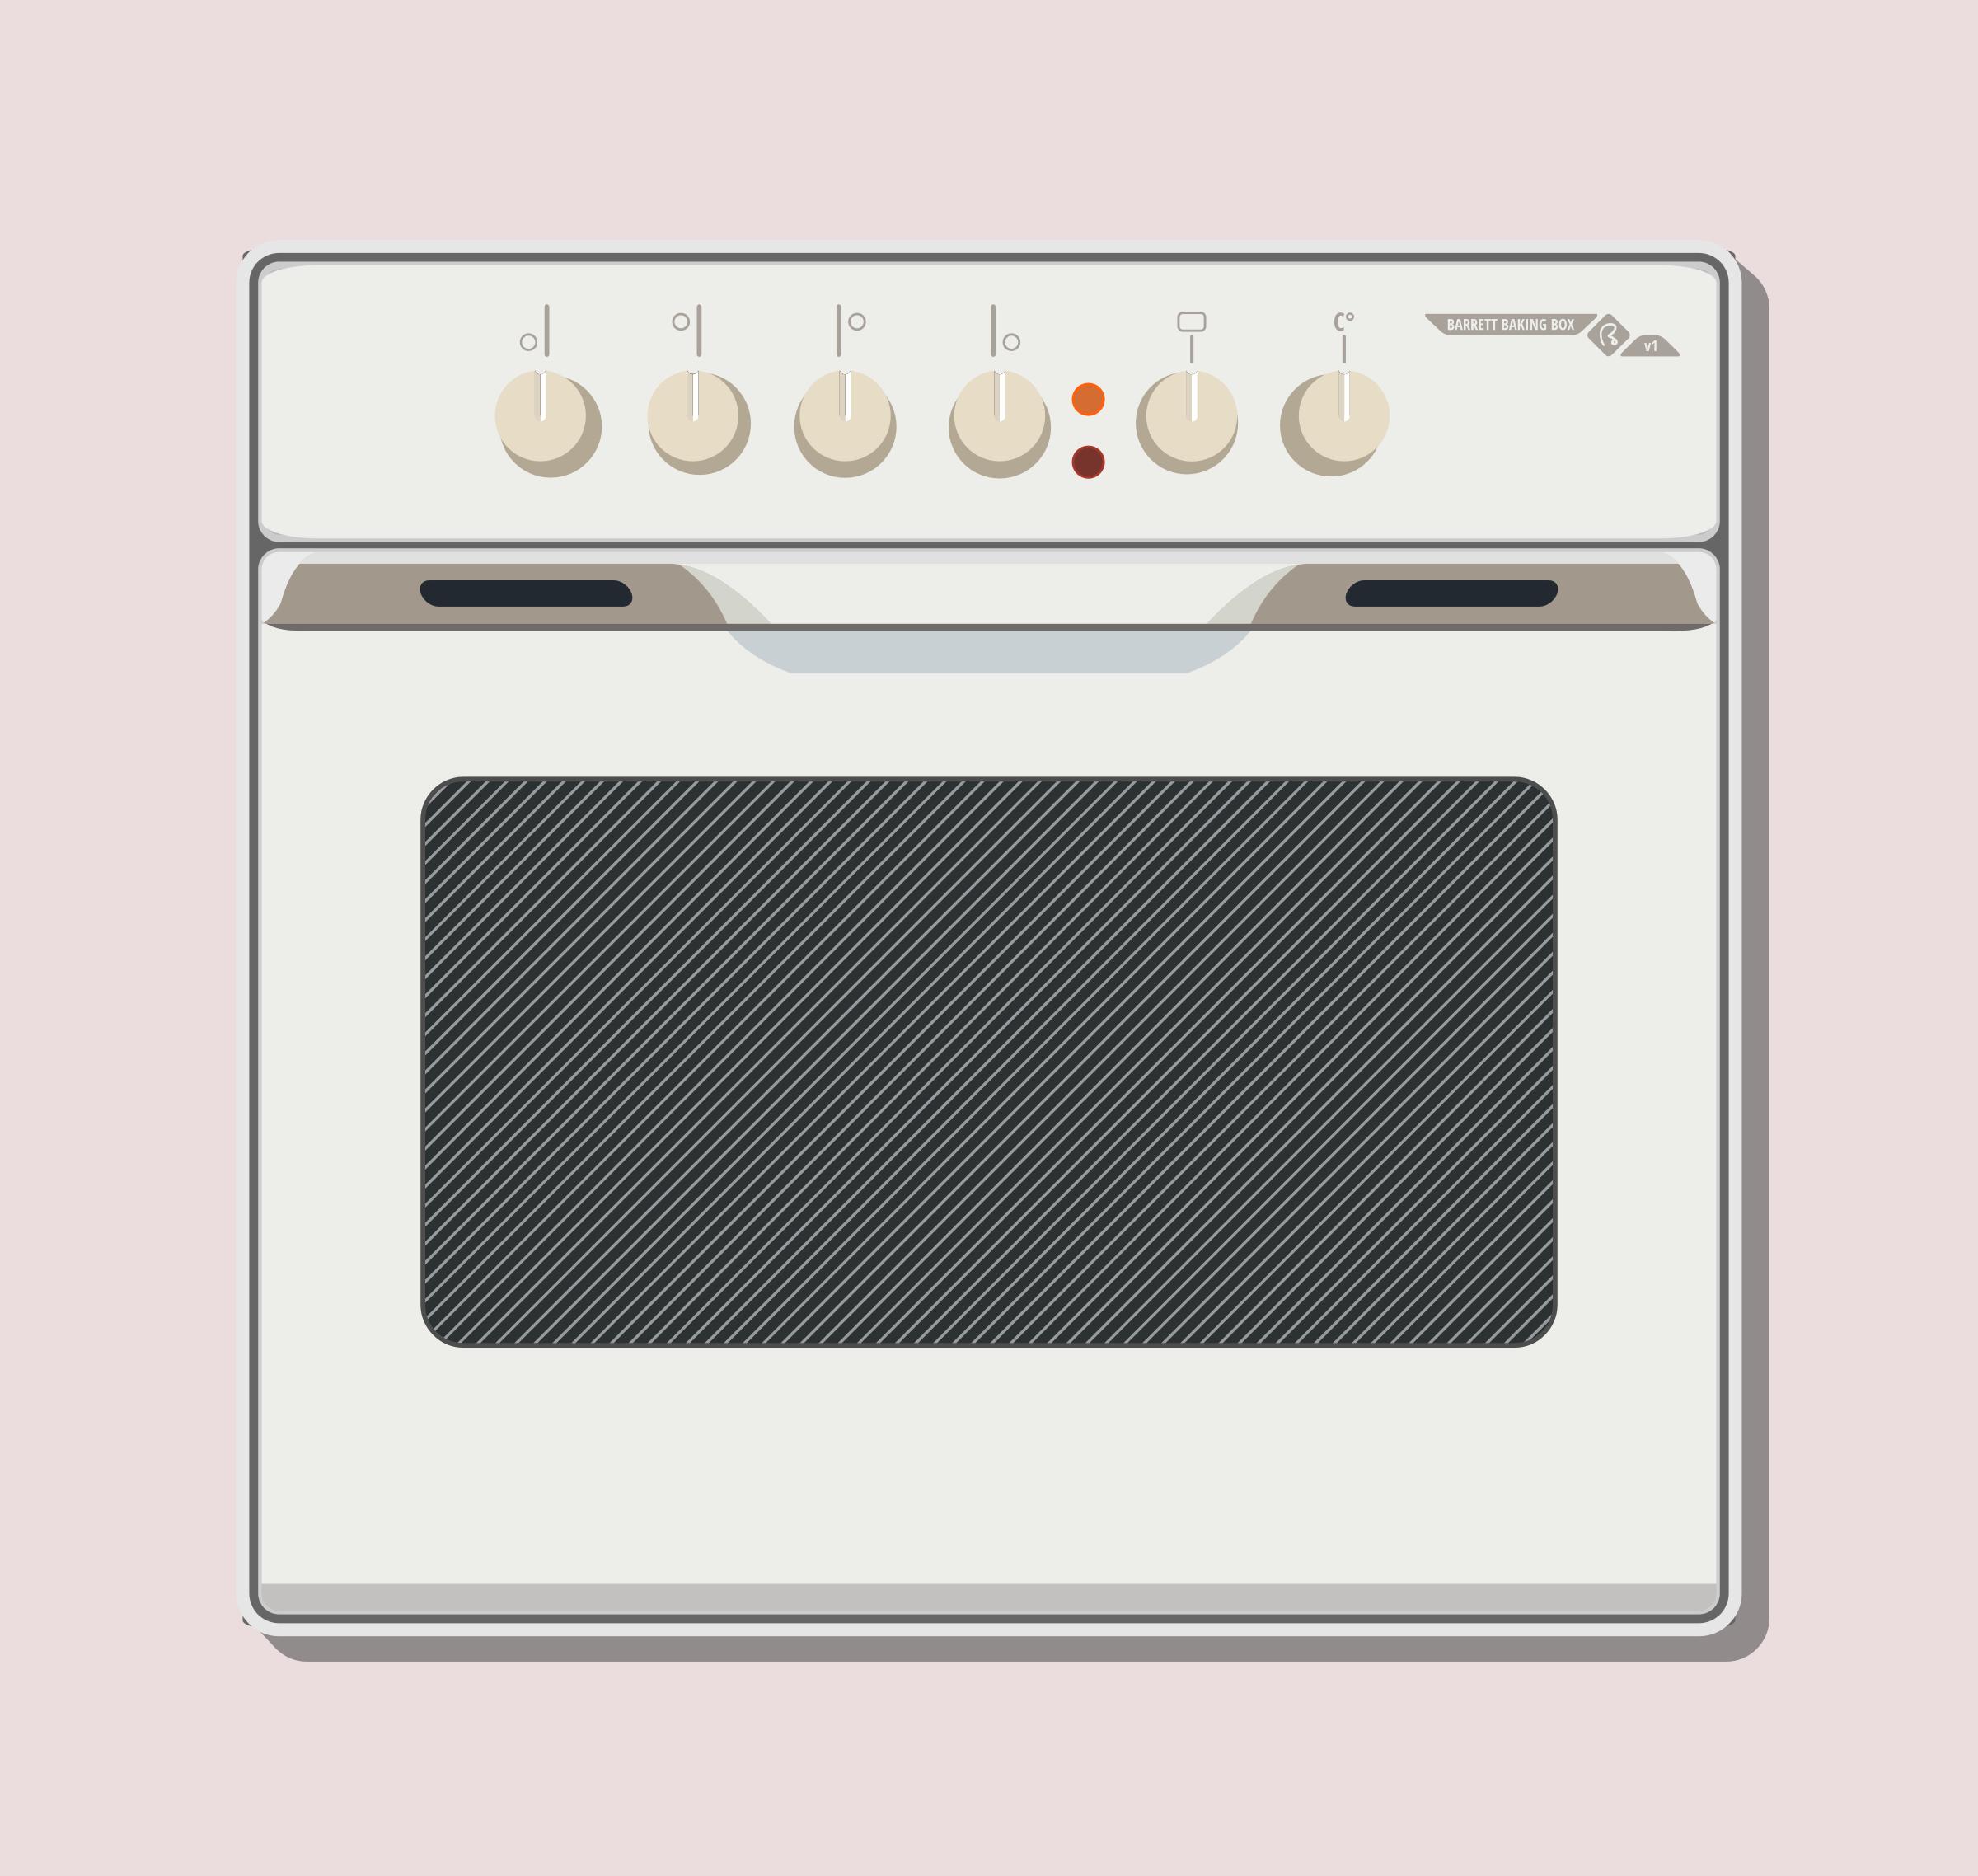 Oven Clip Art ~ Open oven clipart suggest